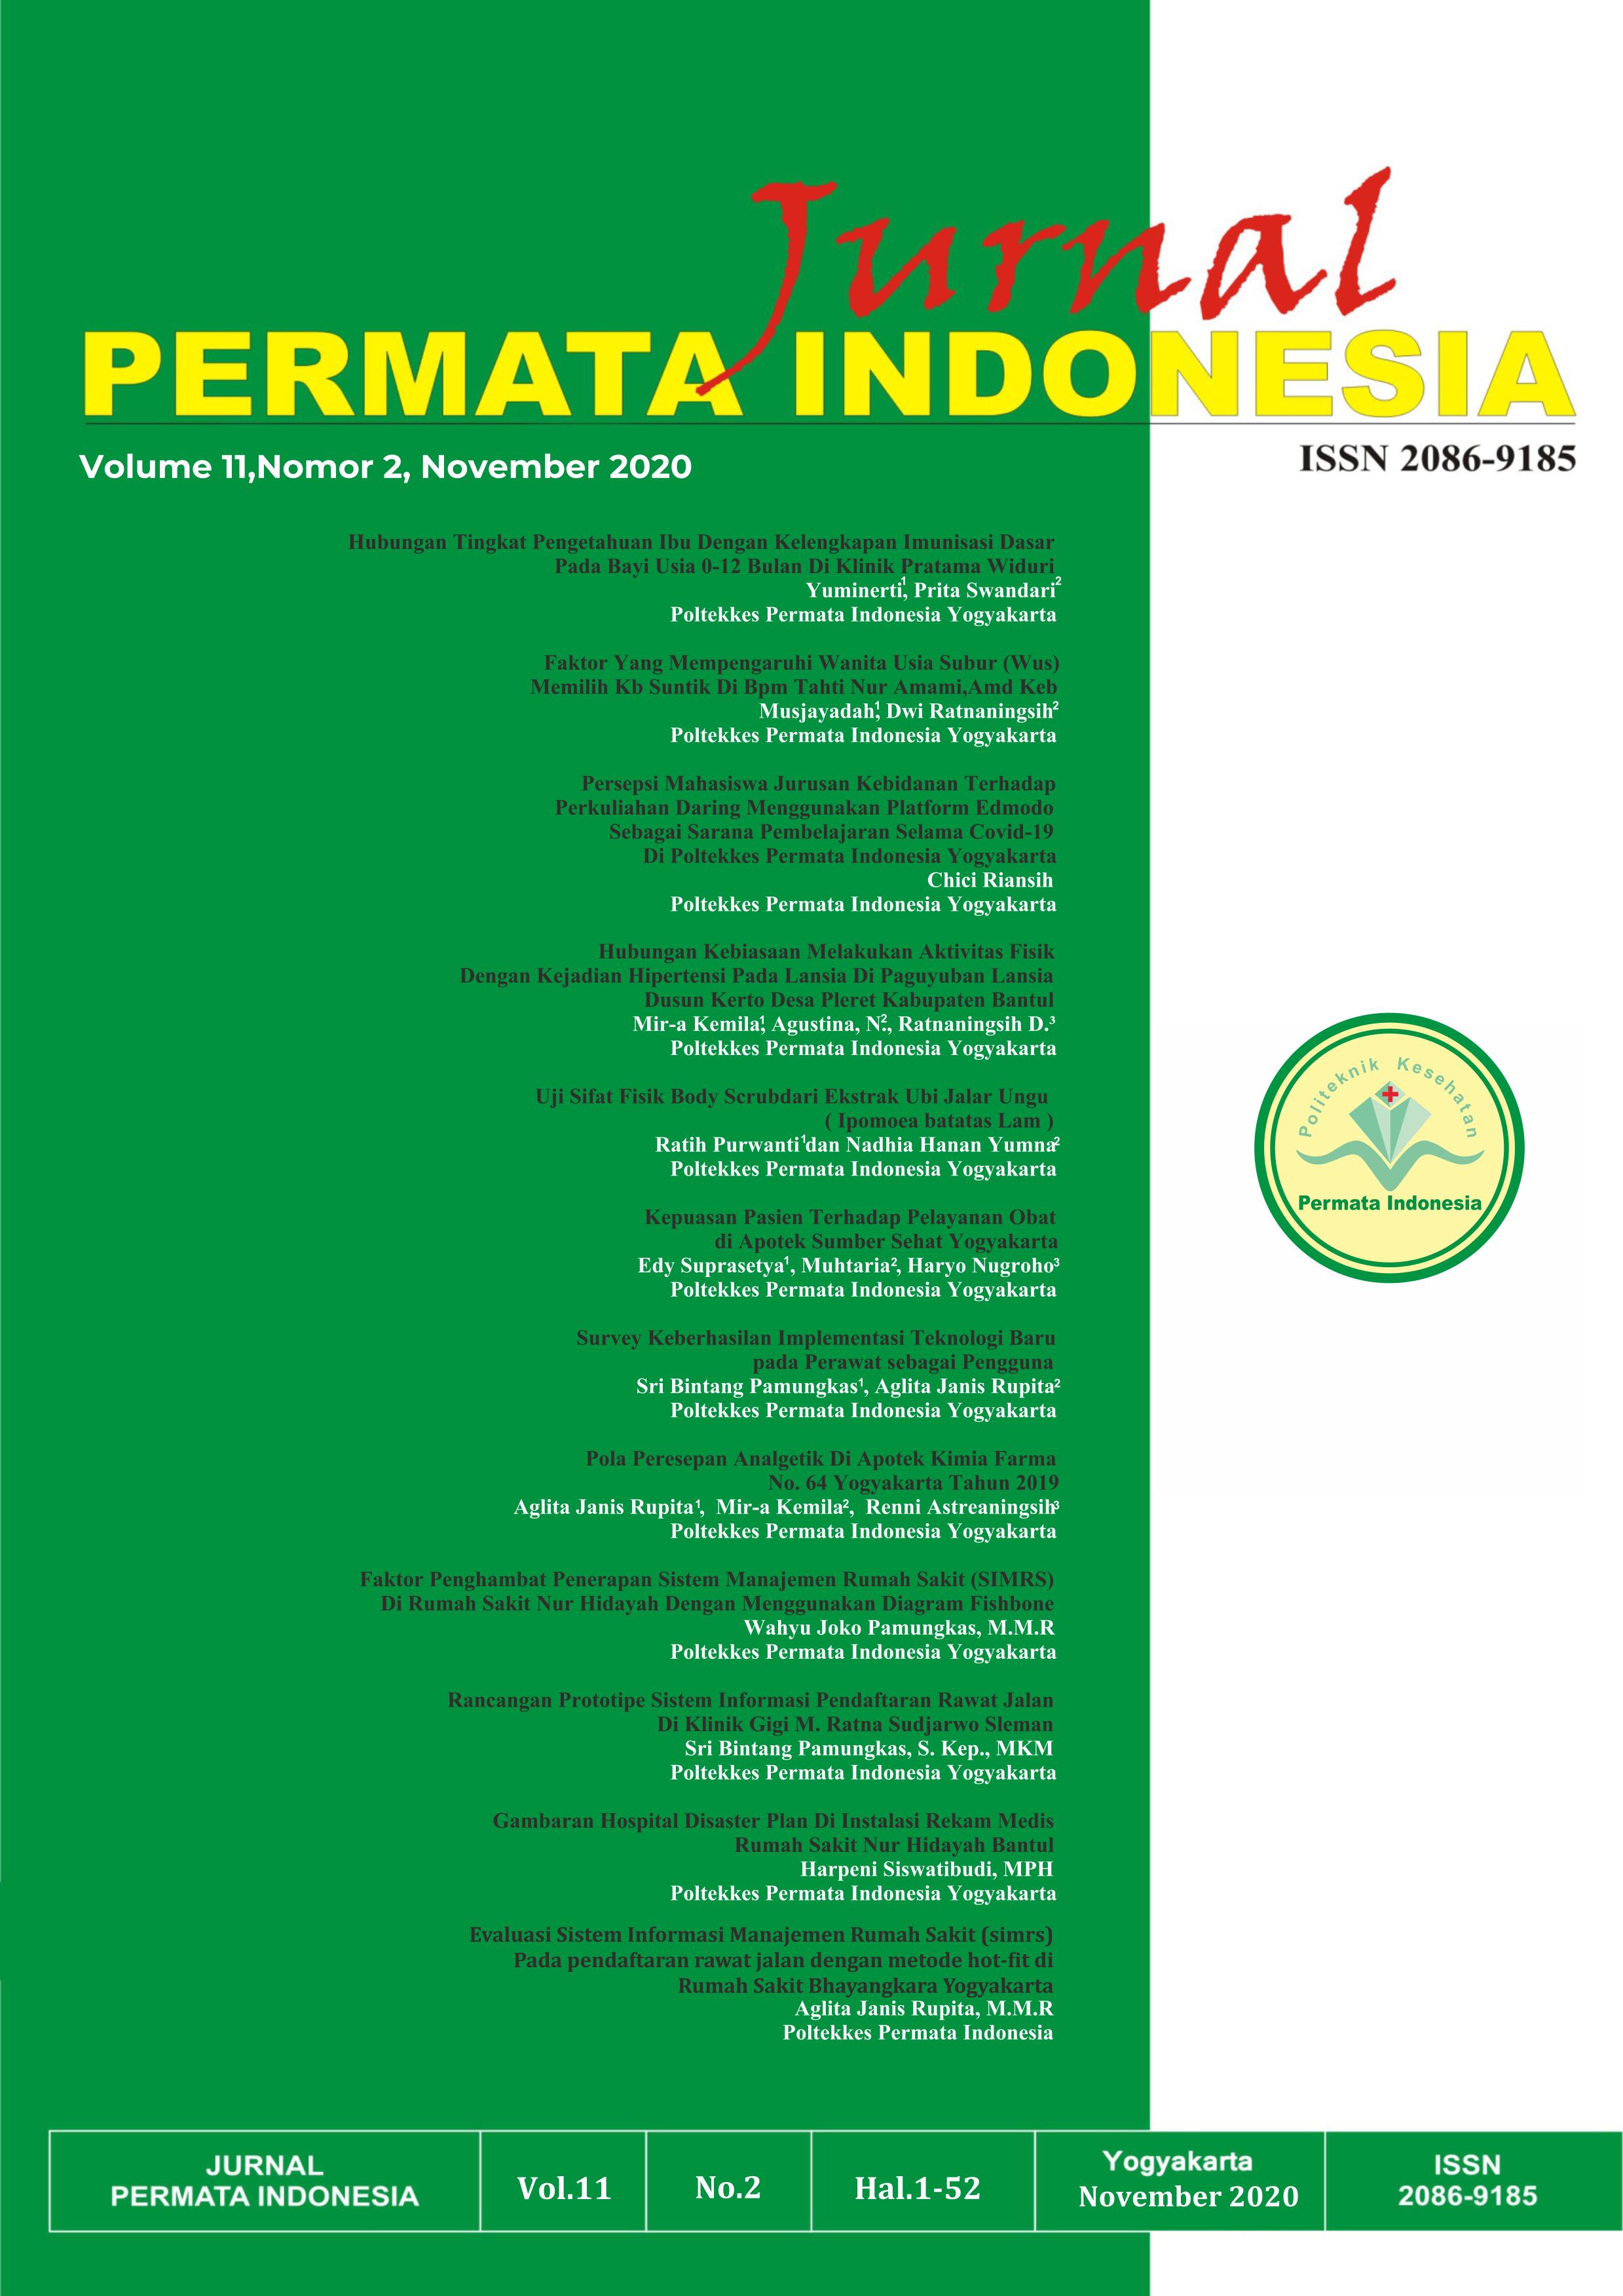 Lihat Jurnal Permata Indonesia Vol.11, No.2, November 2020